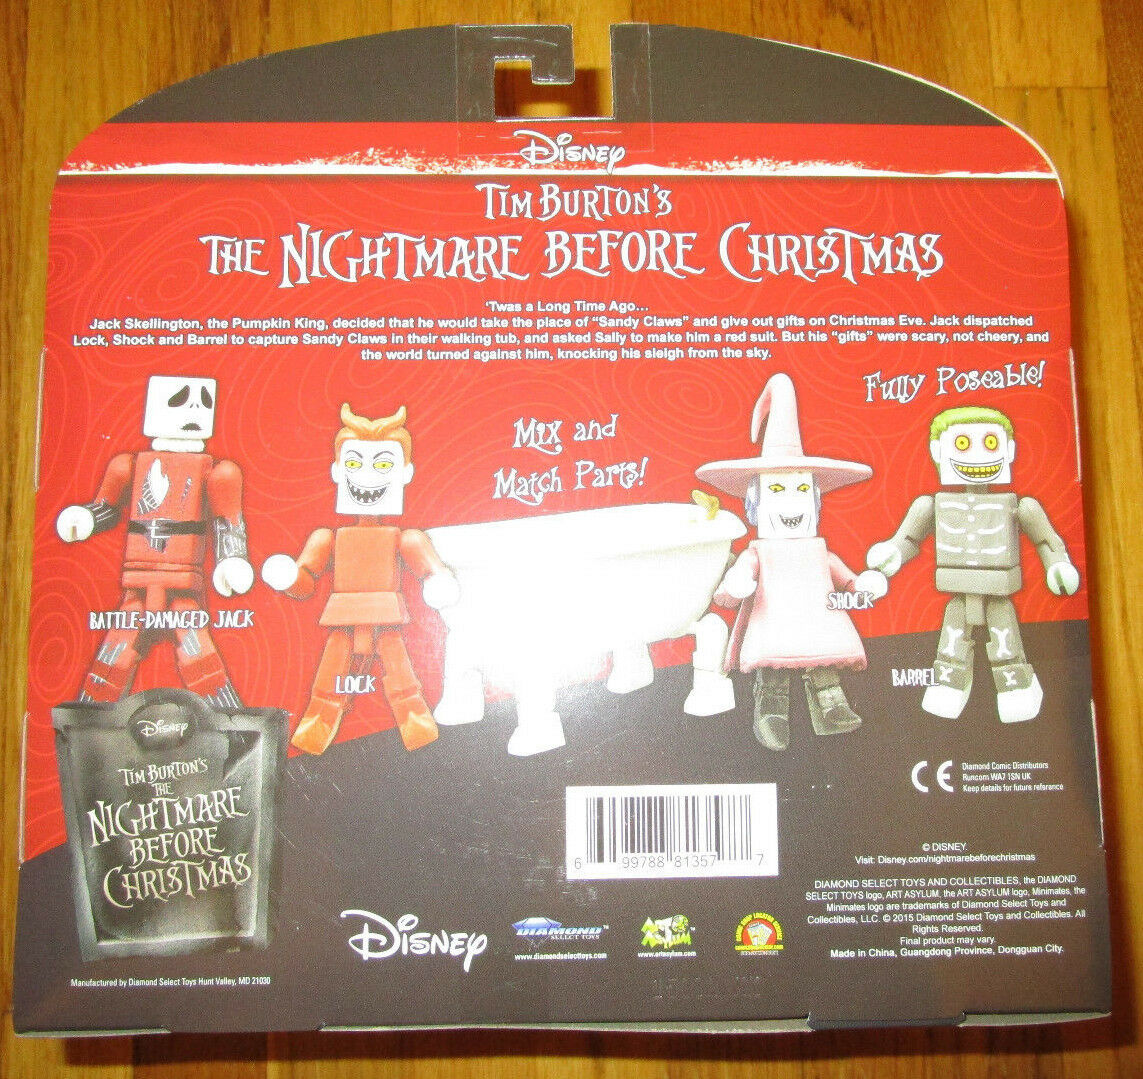 NYCC BEFORE 2015 NIGHTMARE BEFORE NYCC CHRISTMAS MINIMATES DELUXE BOX SET DIAMOND SELECT feba73